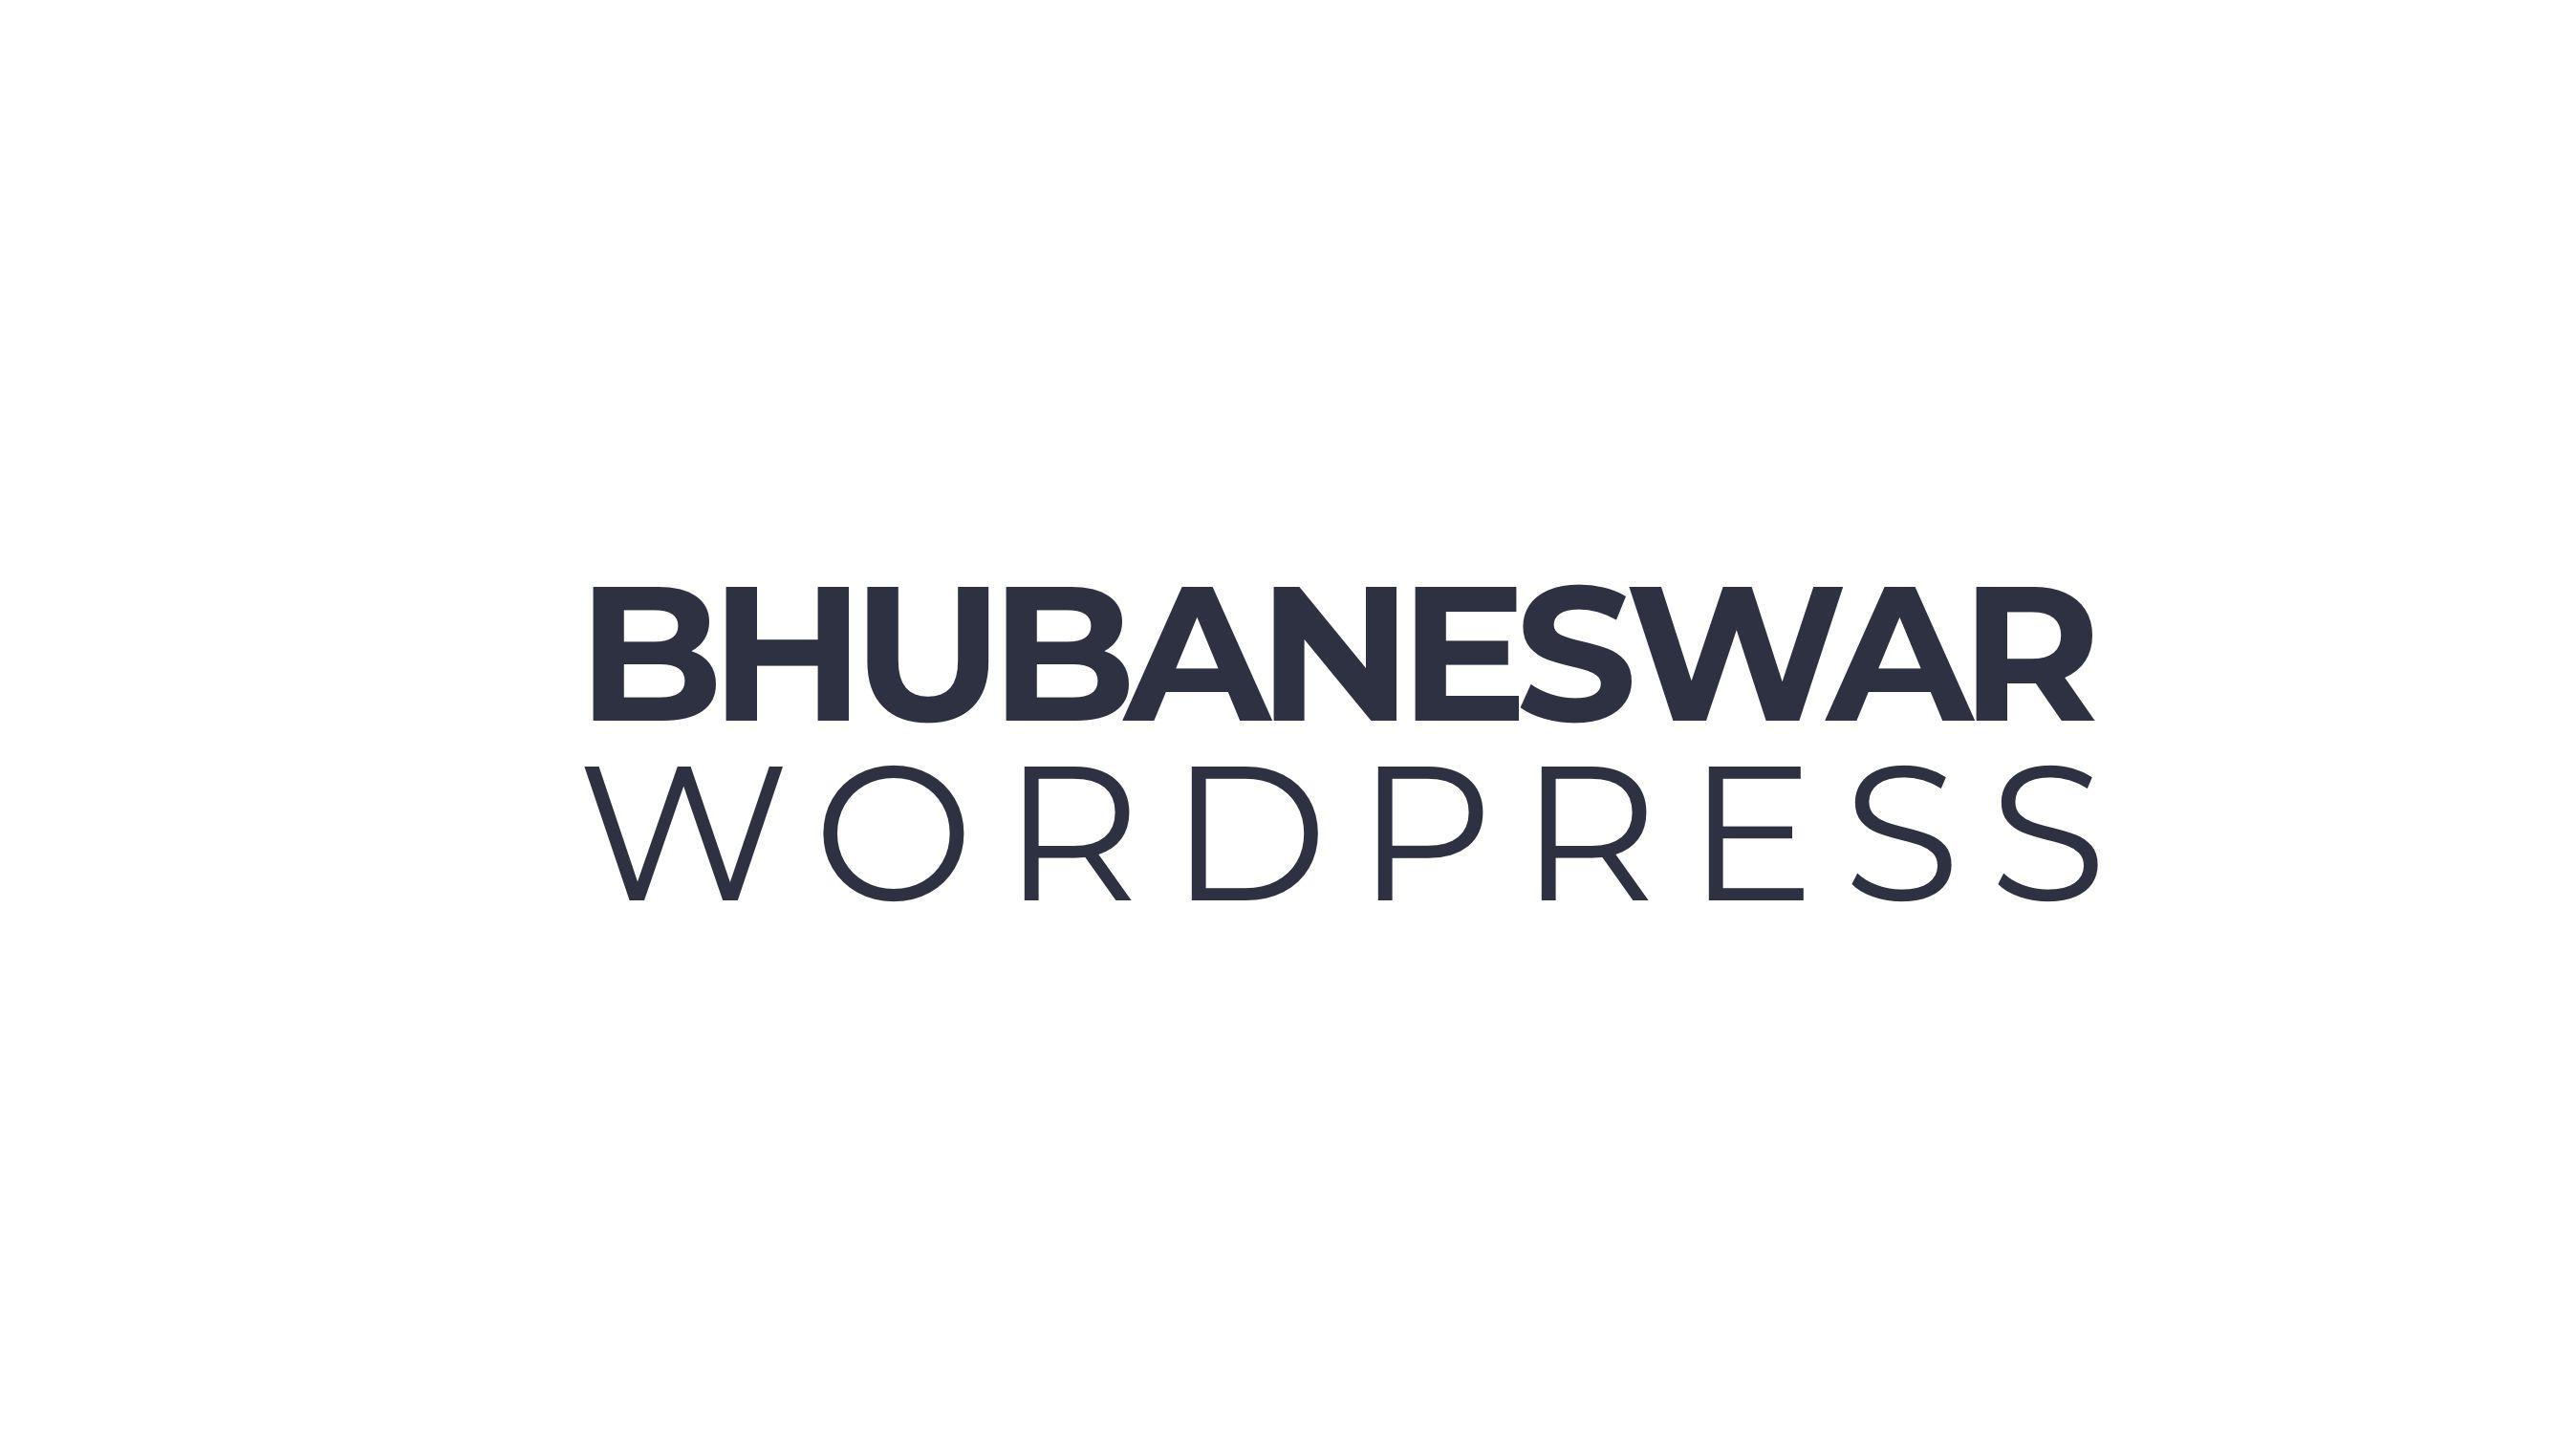 Bhubaneswar WordPress Meetup